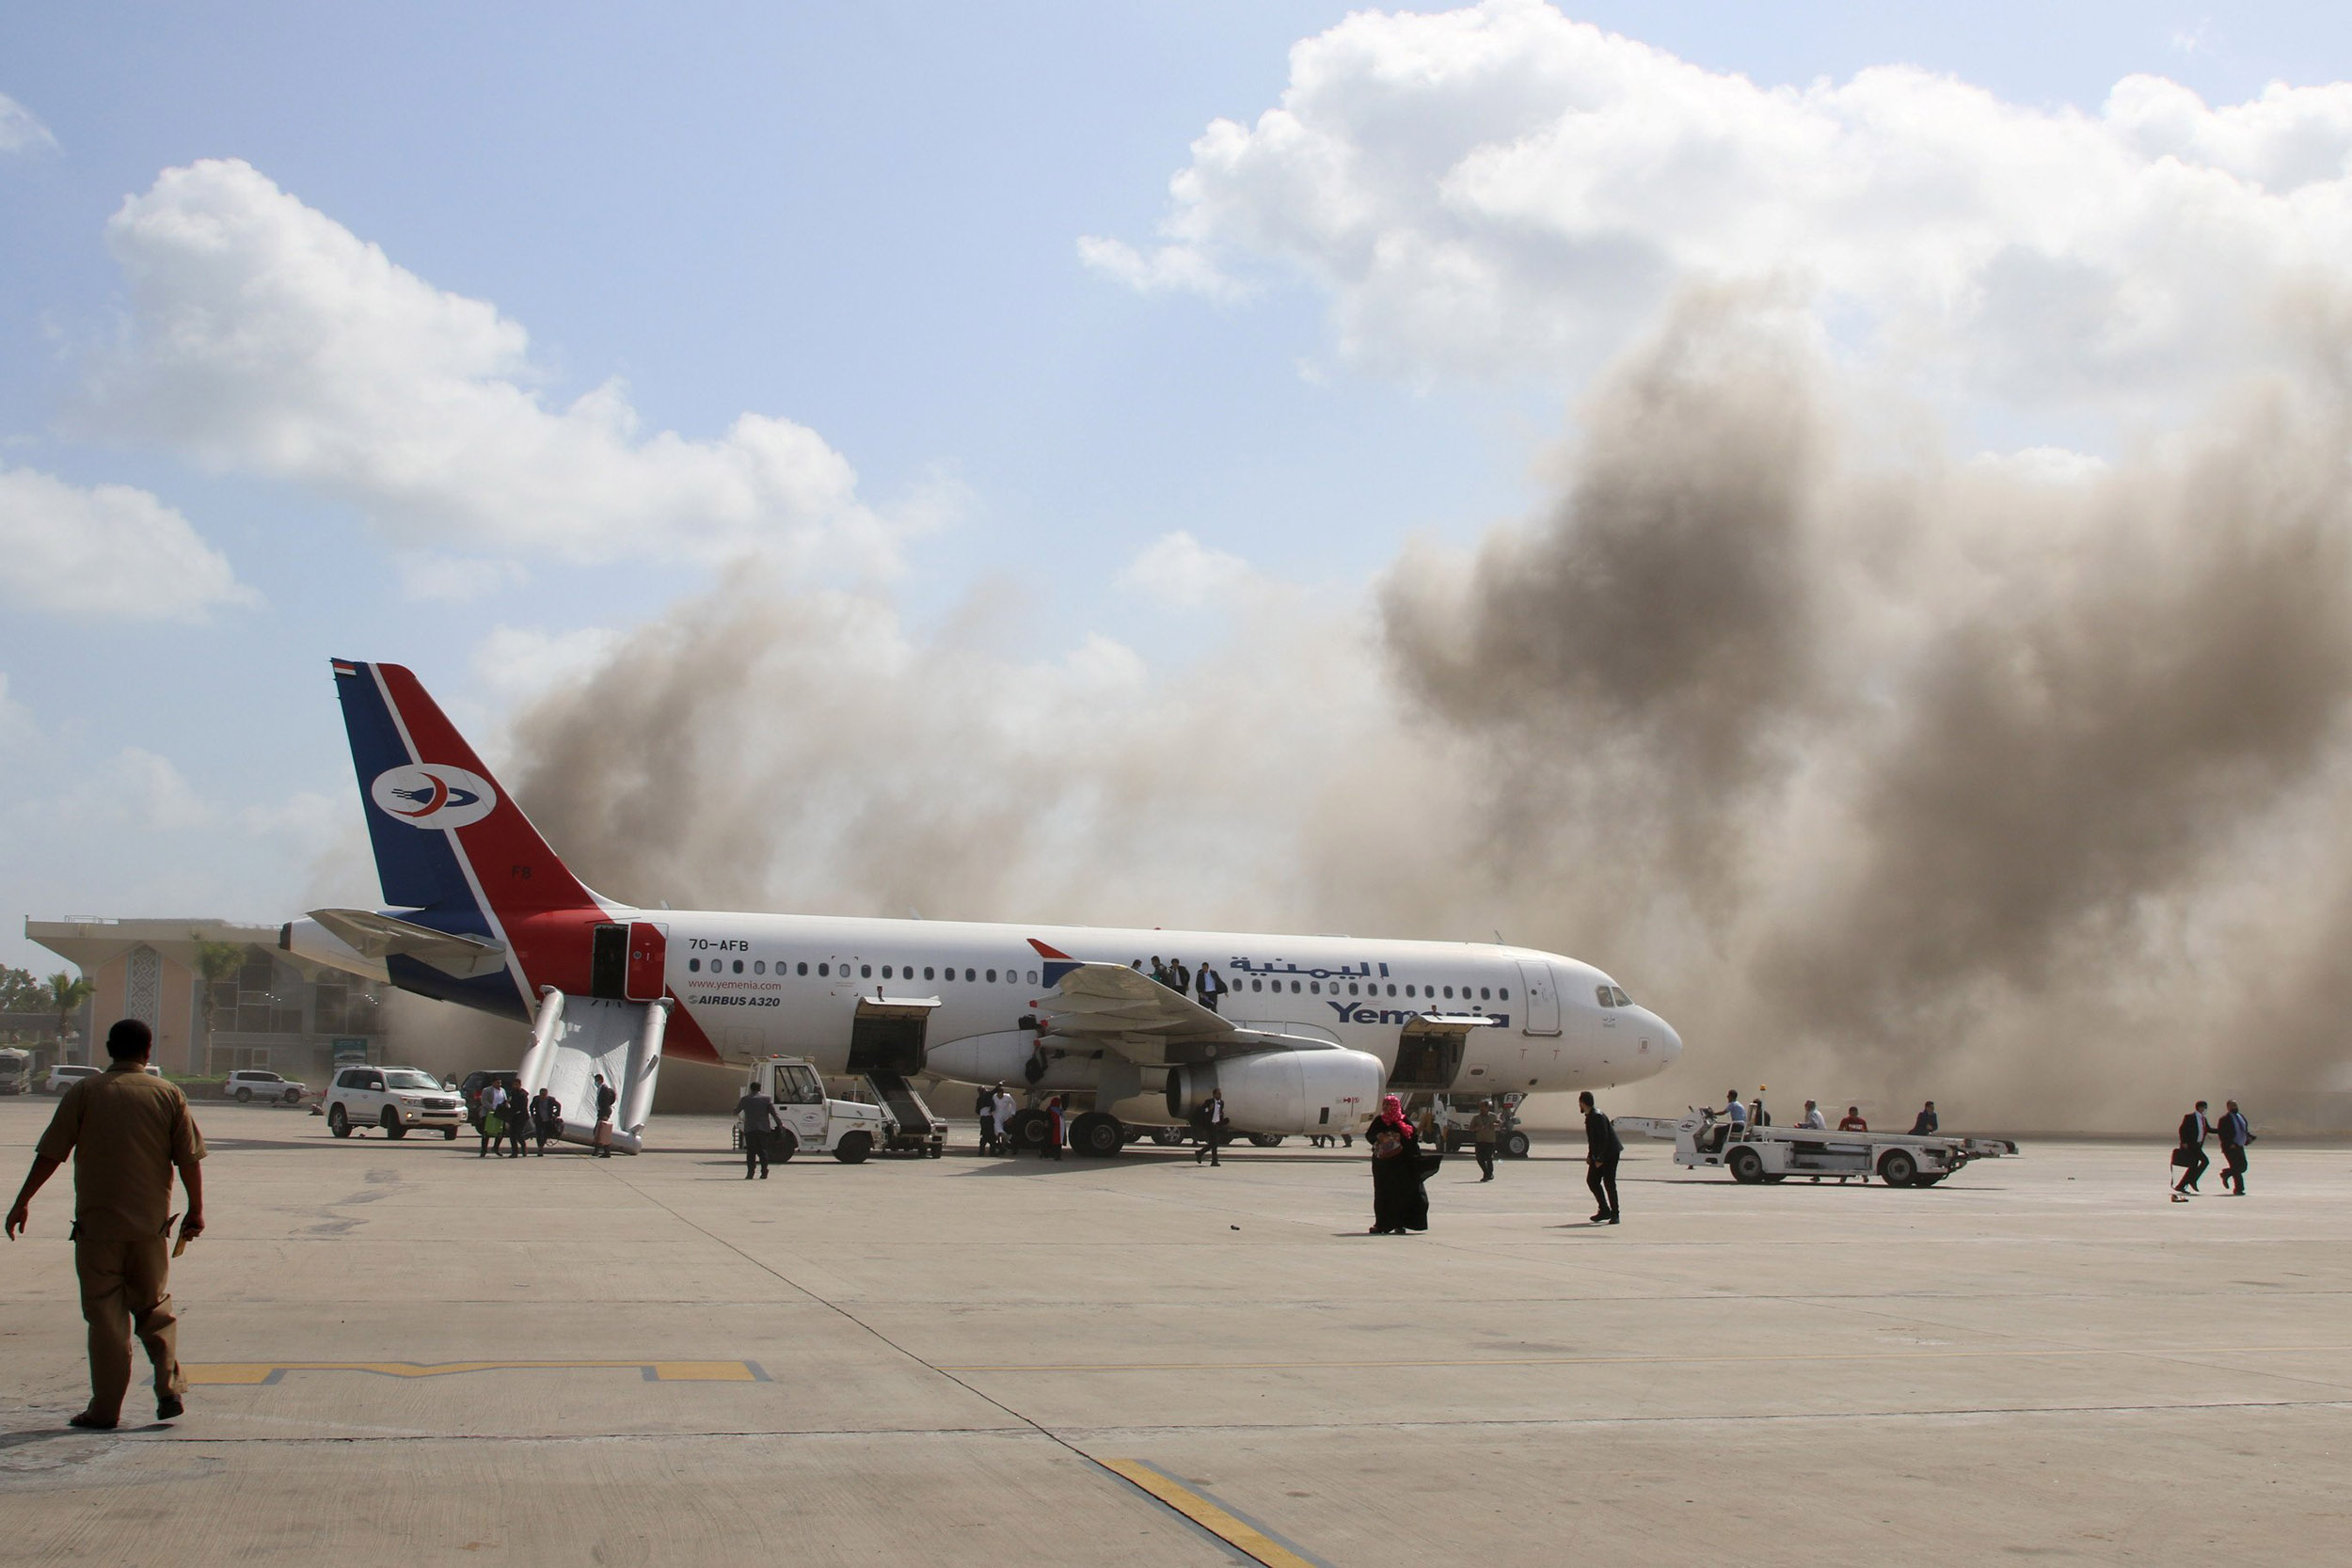 201230-yemen-blast-mc-12142_2fbaf7227019